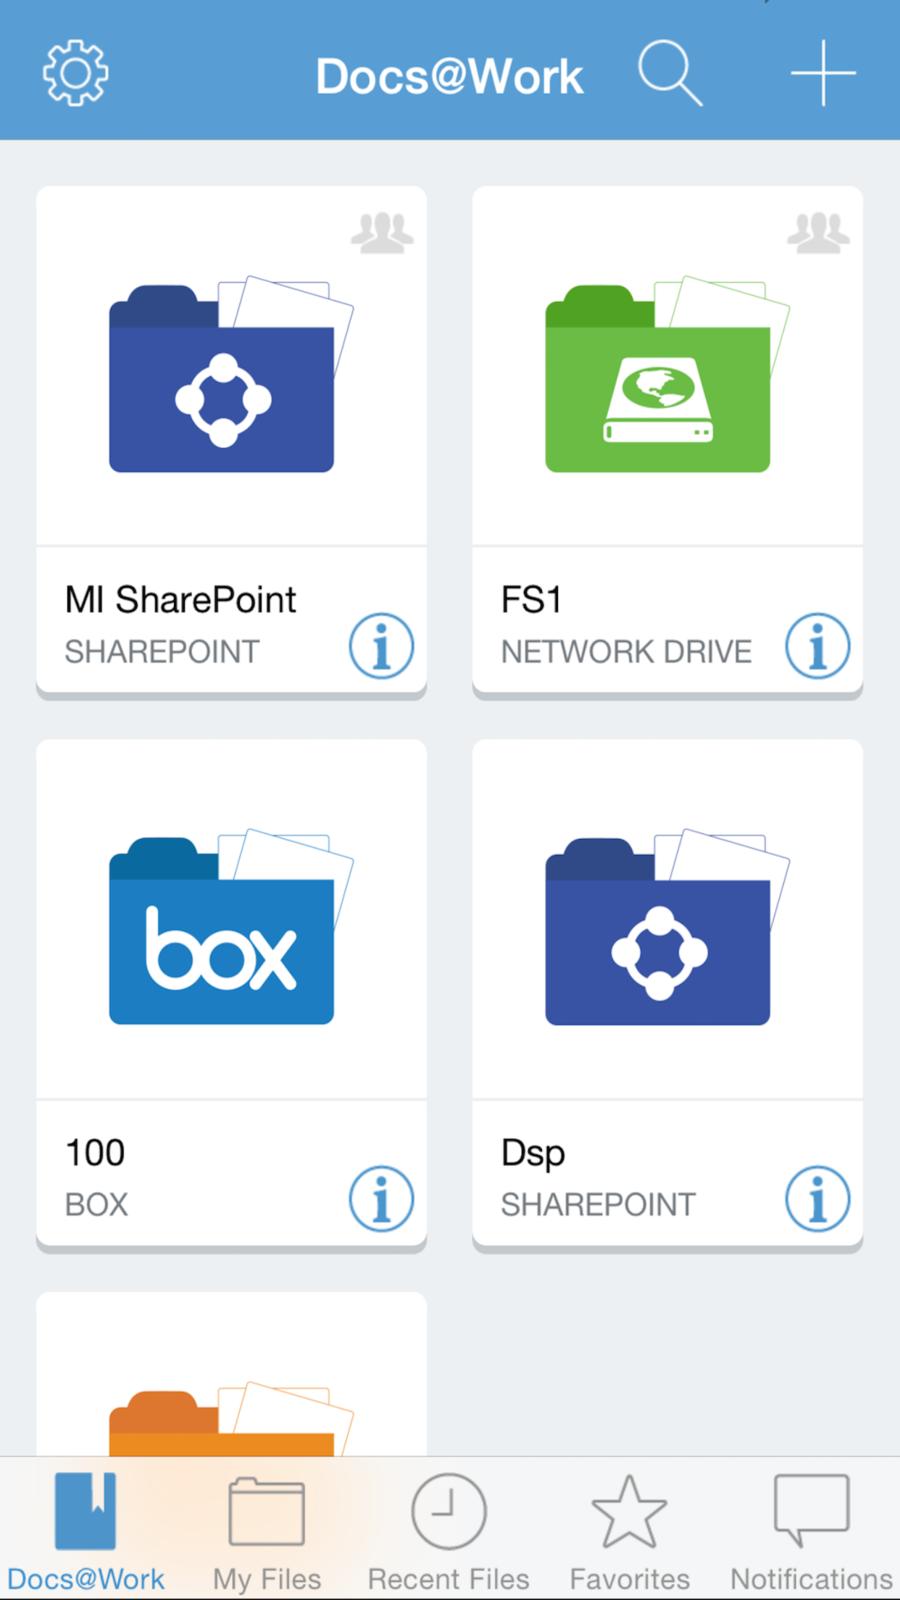 MobileIron DocsWork iosProductivityappapps (With